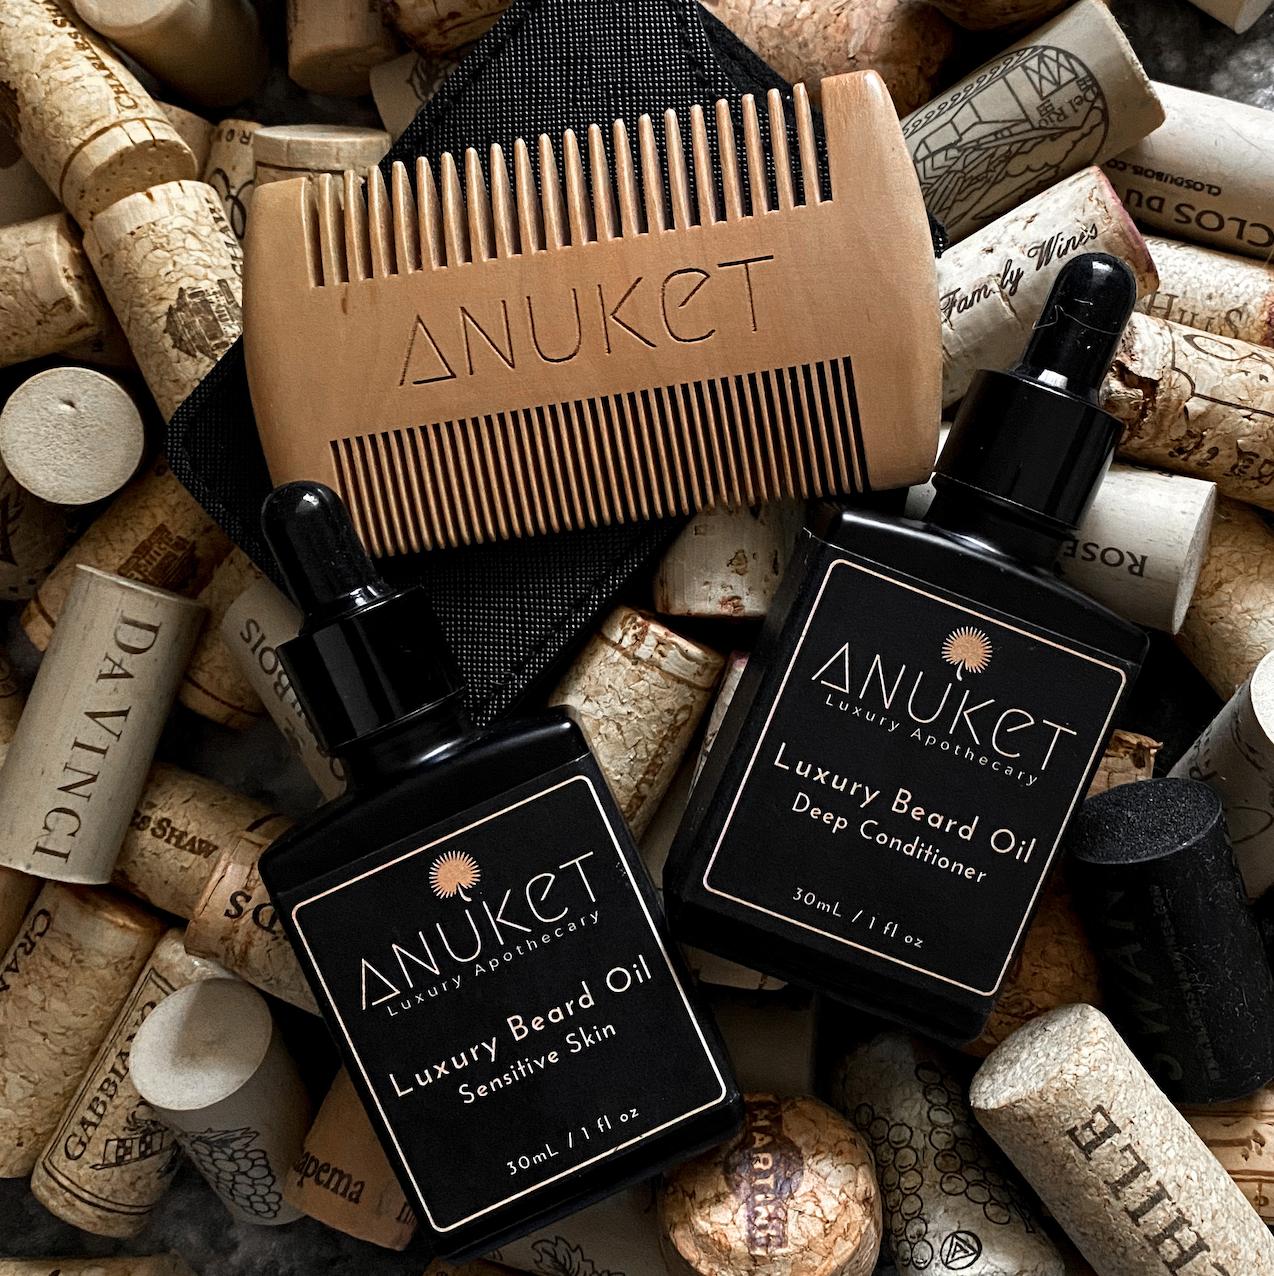 Anuket's Two Luxury Beard Oil Formulas and Sandalwood Beard Comb lying on a background of wine corks